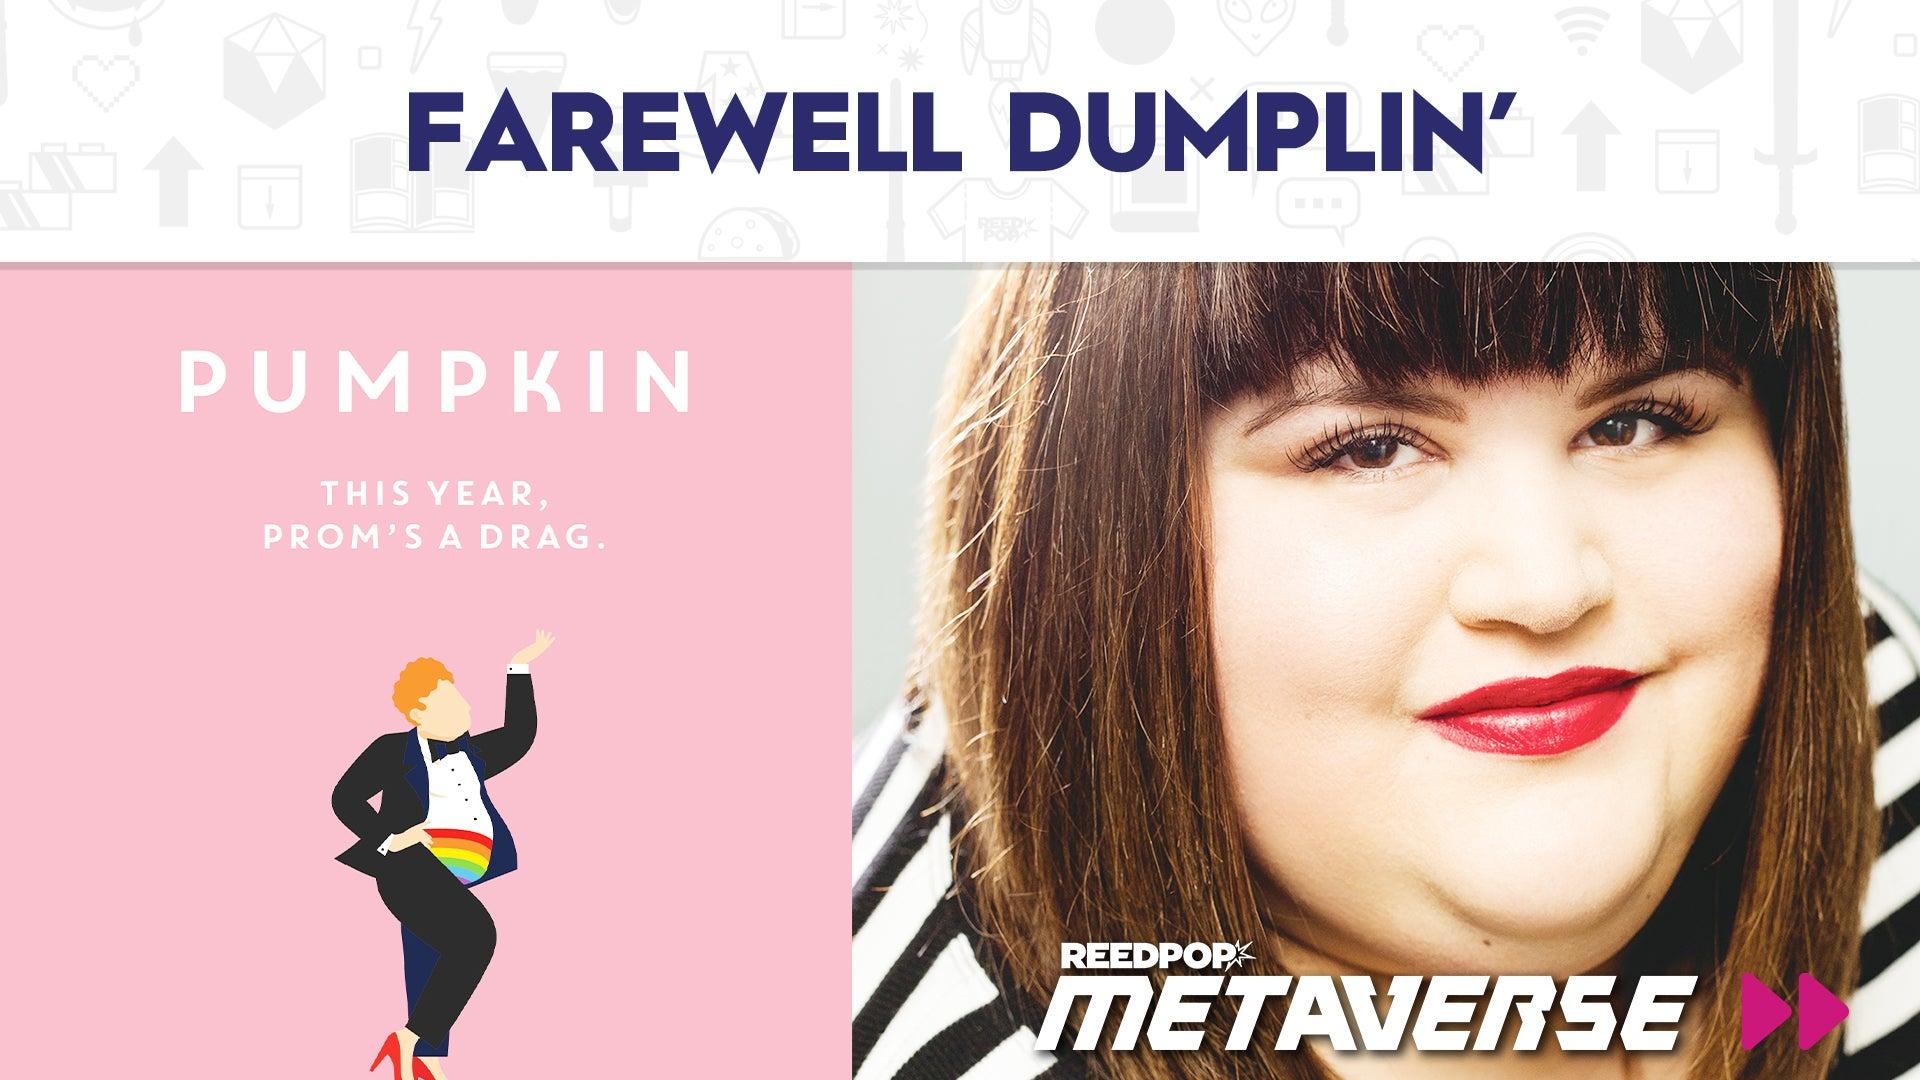 Image for DUMPLIN'-verse Goodbye Party